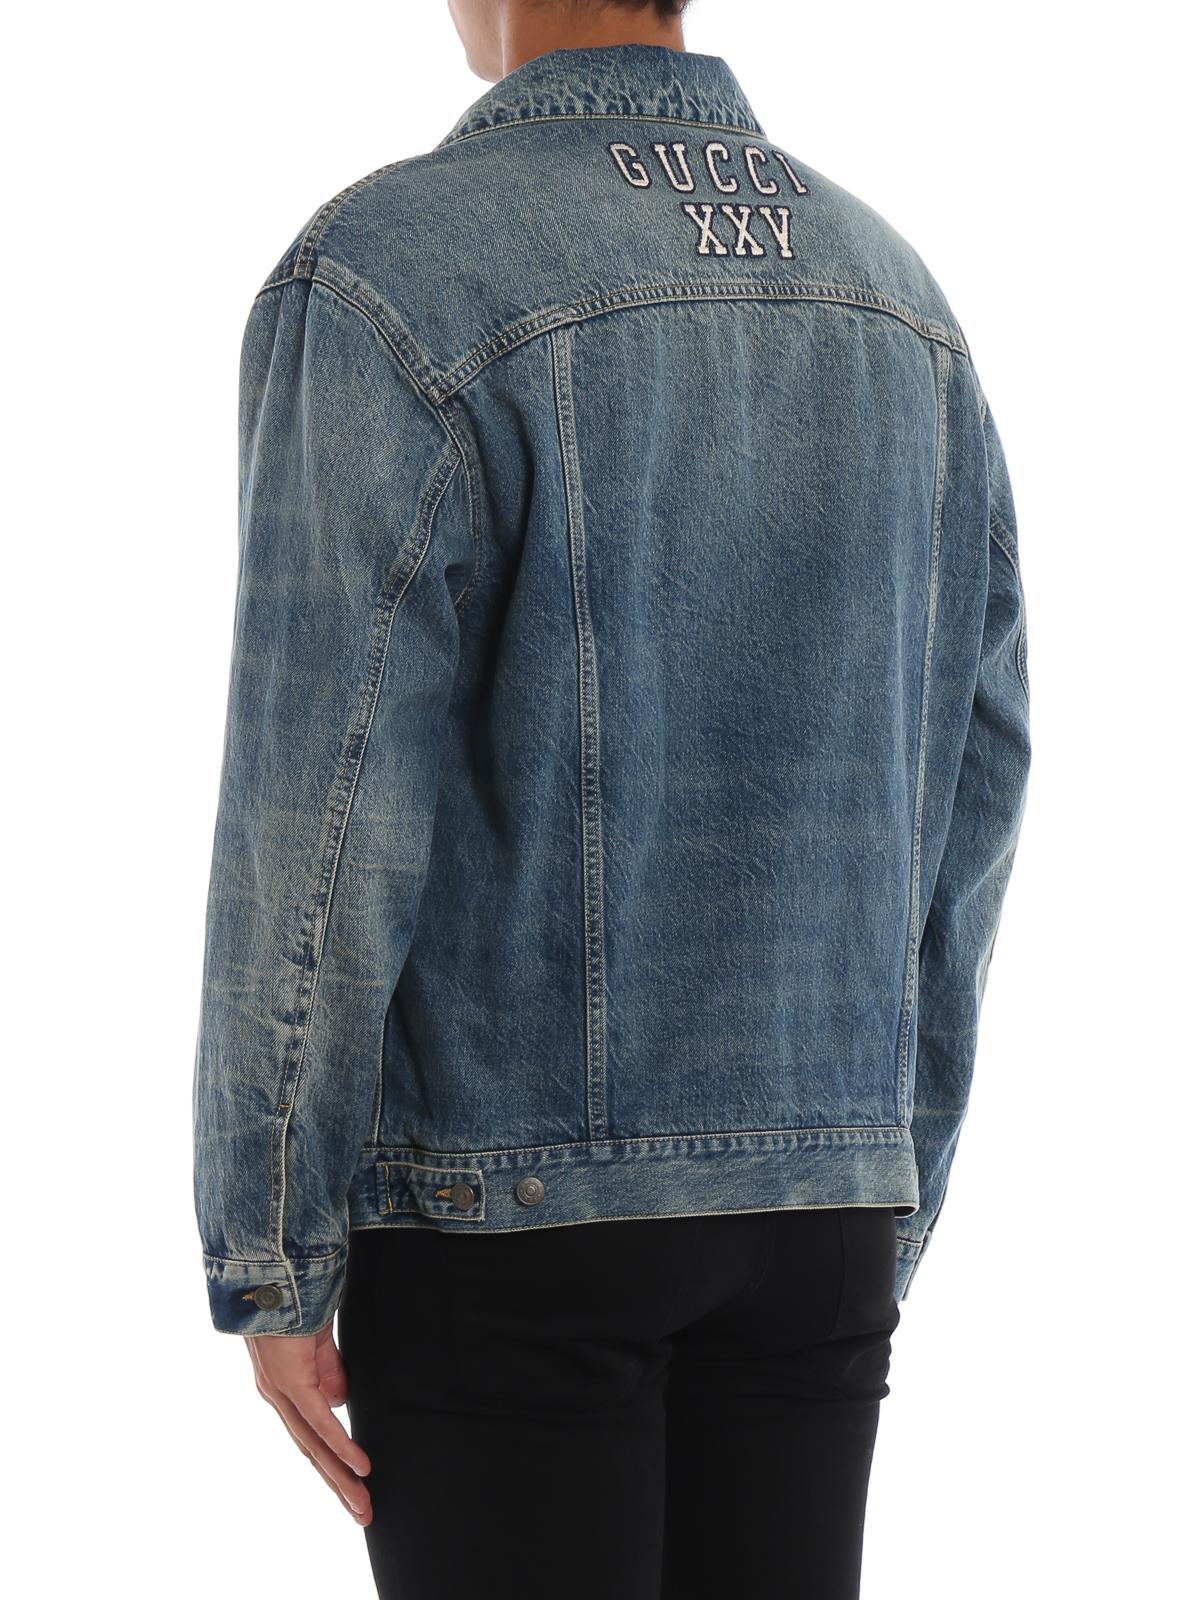 ff84d288e48 Gucci - NY Yankees™ patch denim jacket - denim jacket - 475024XRC854494